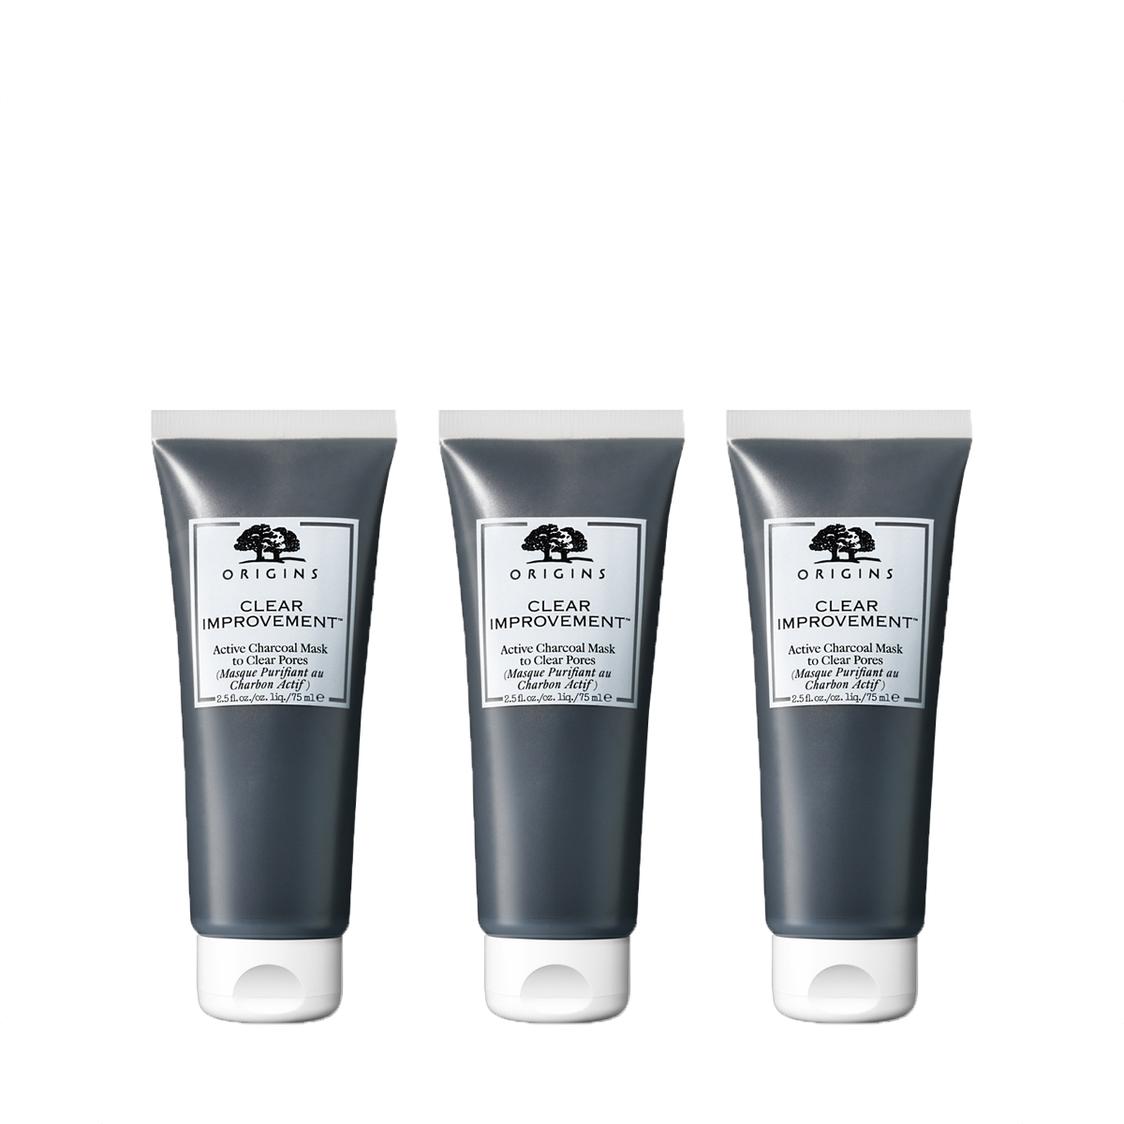 Origins Clear Improvement Mask Trio Kit